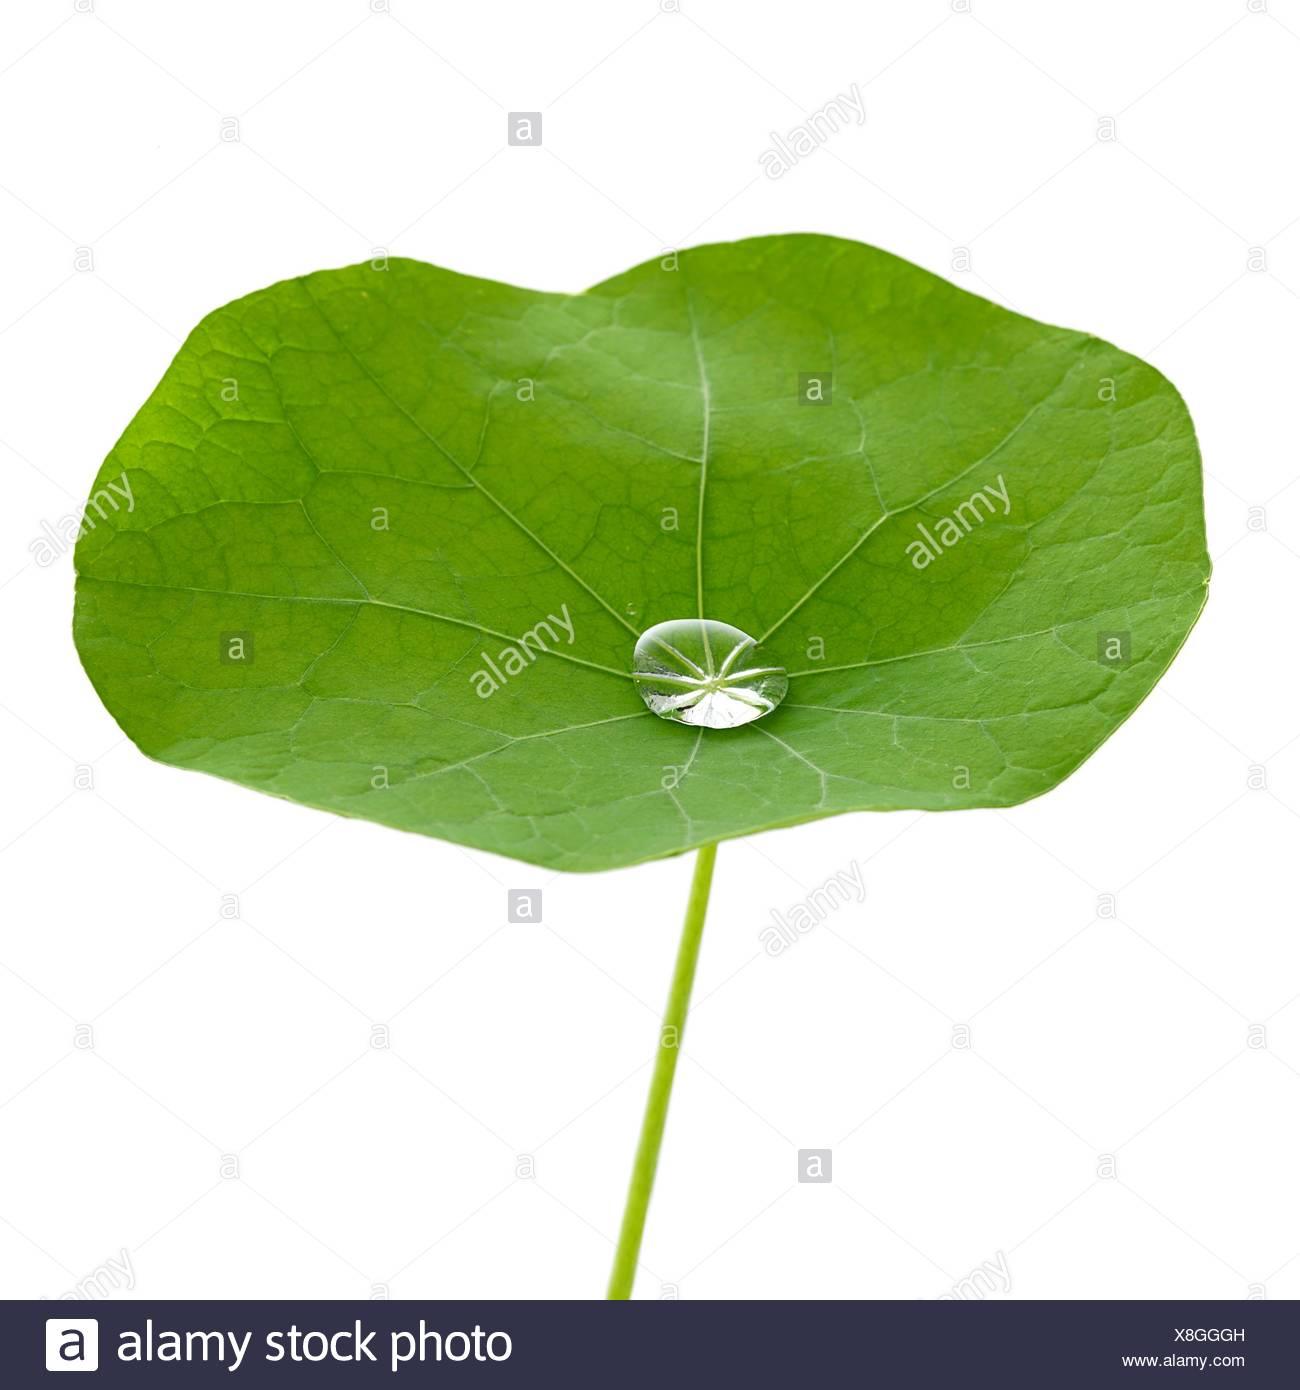 Nasturtium leaf with water droplet. Stock Photo